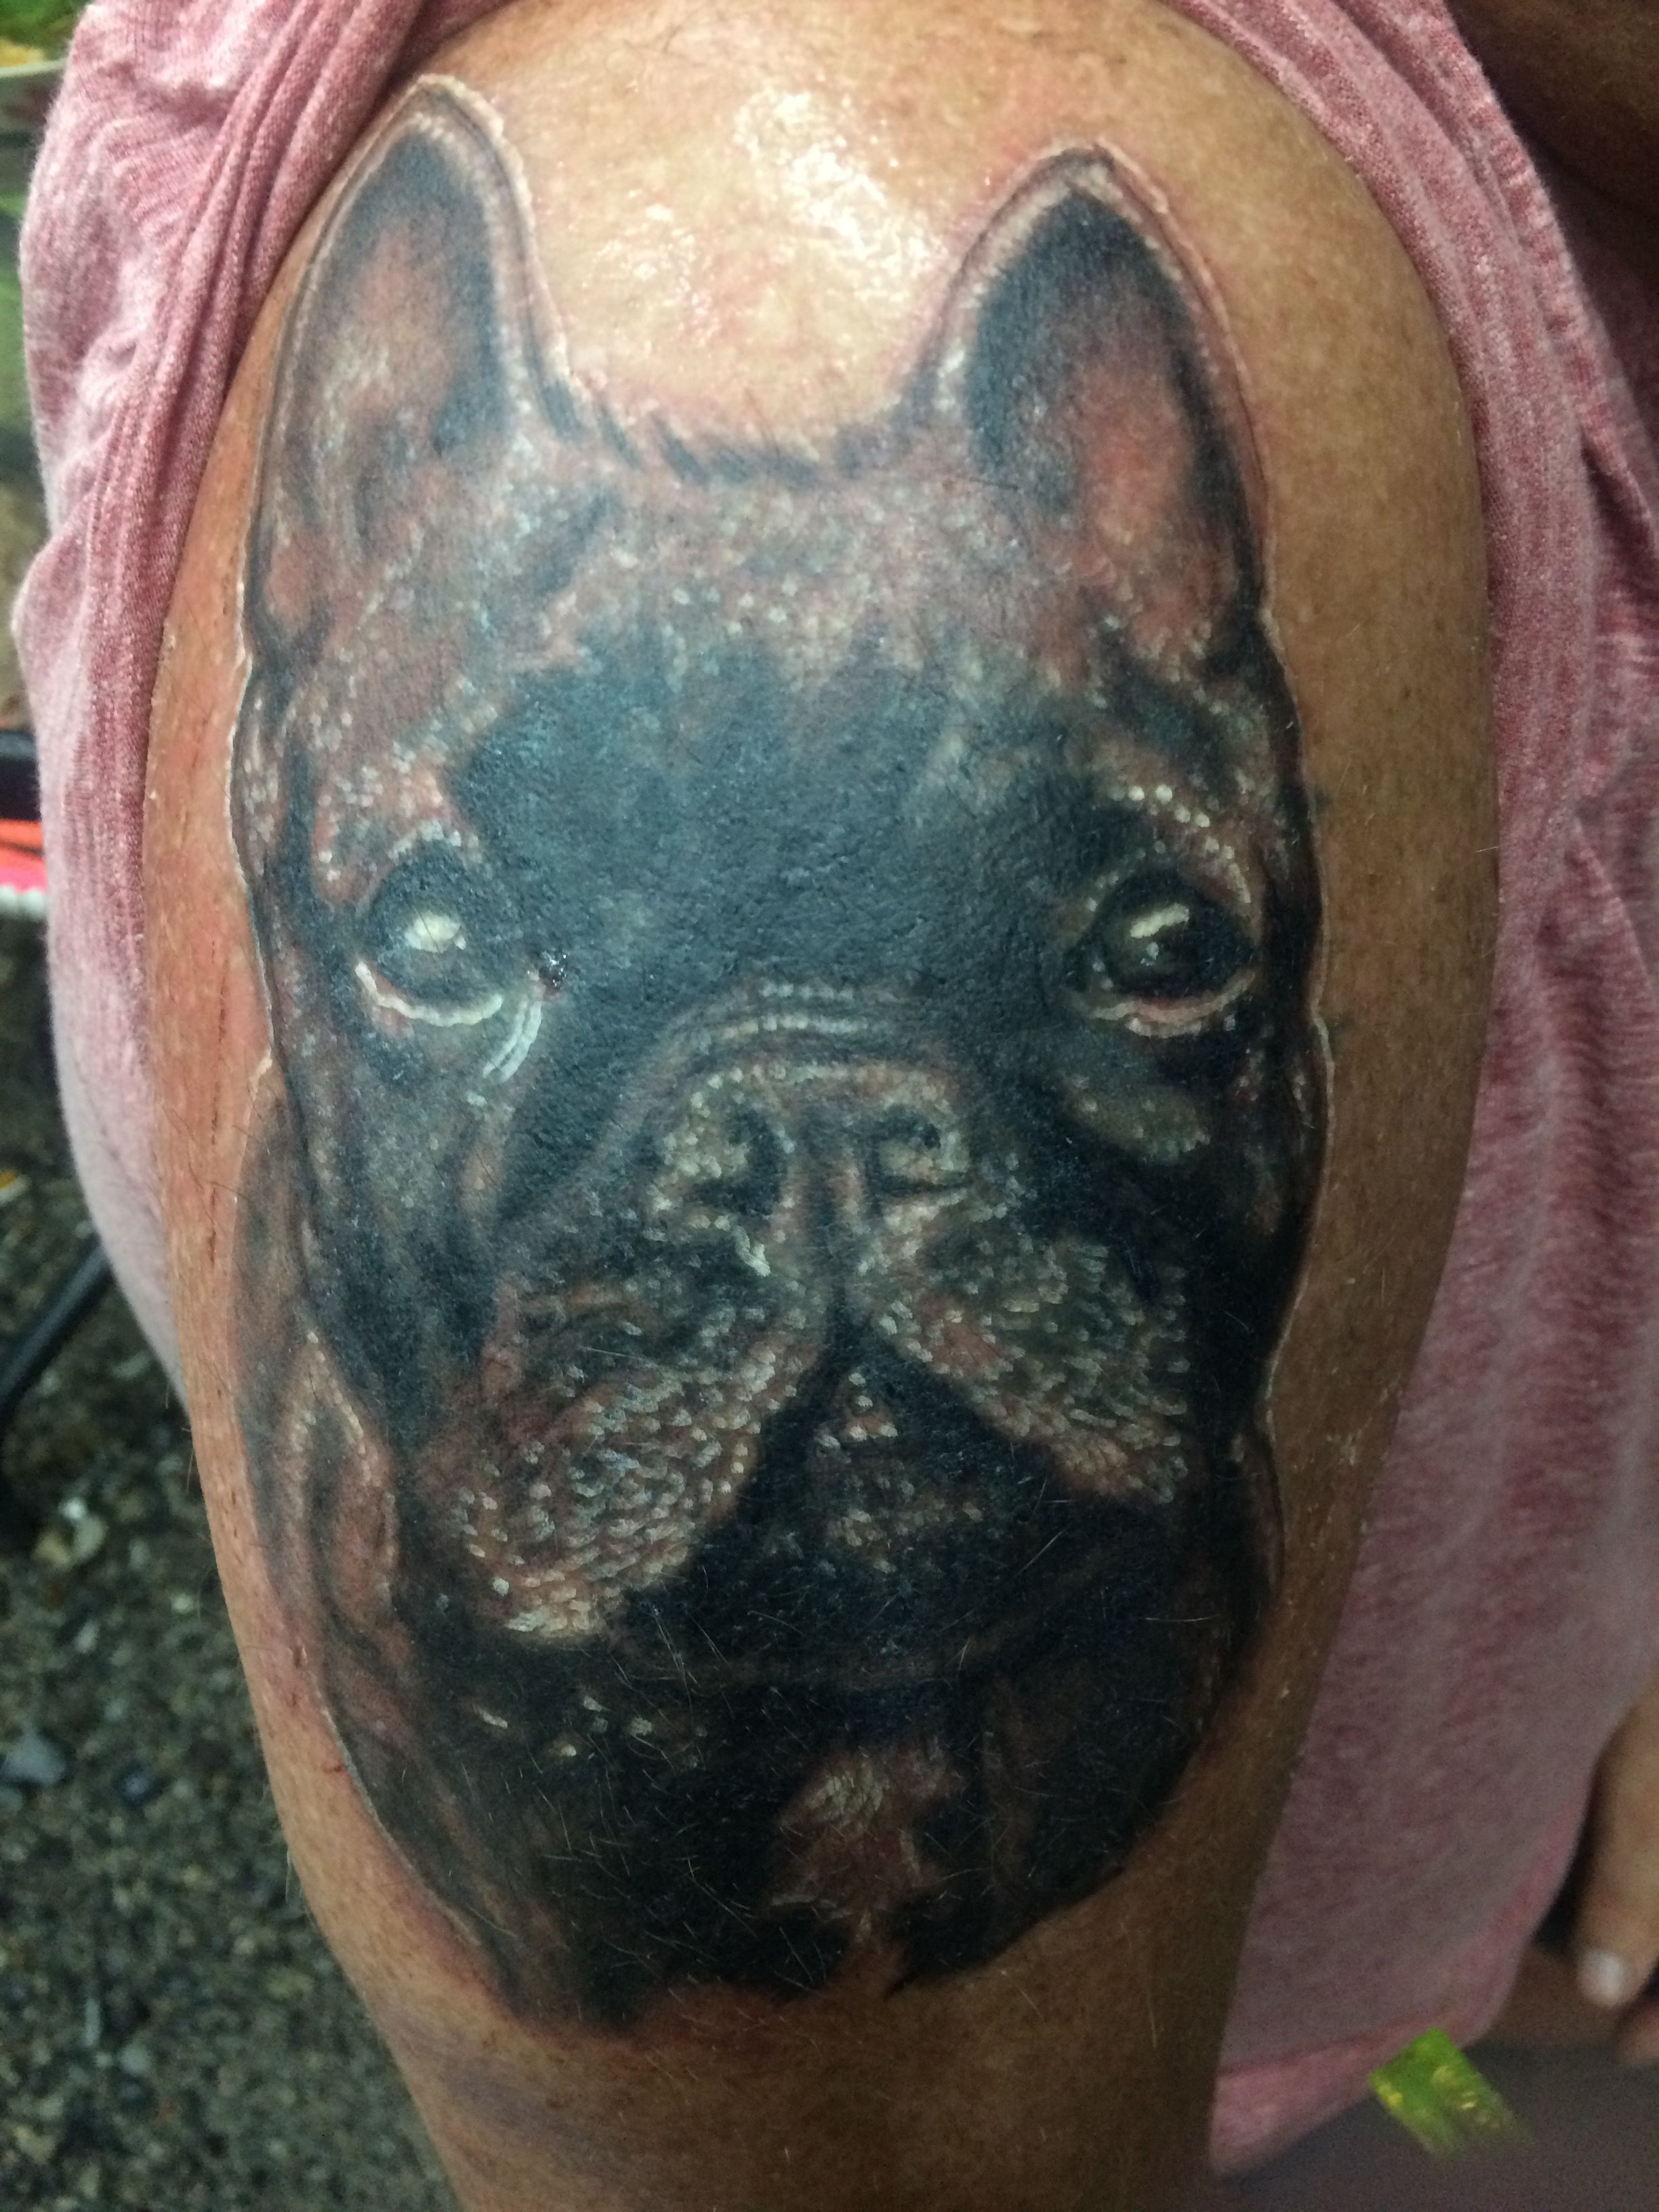 Tattoos for men love pin by voravit rattanaintanin on jadedtattoo  pinterest